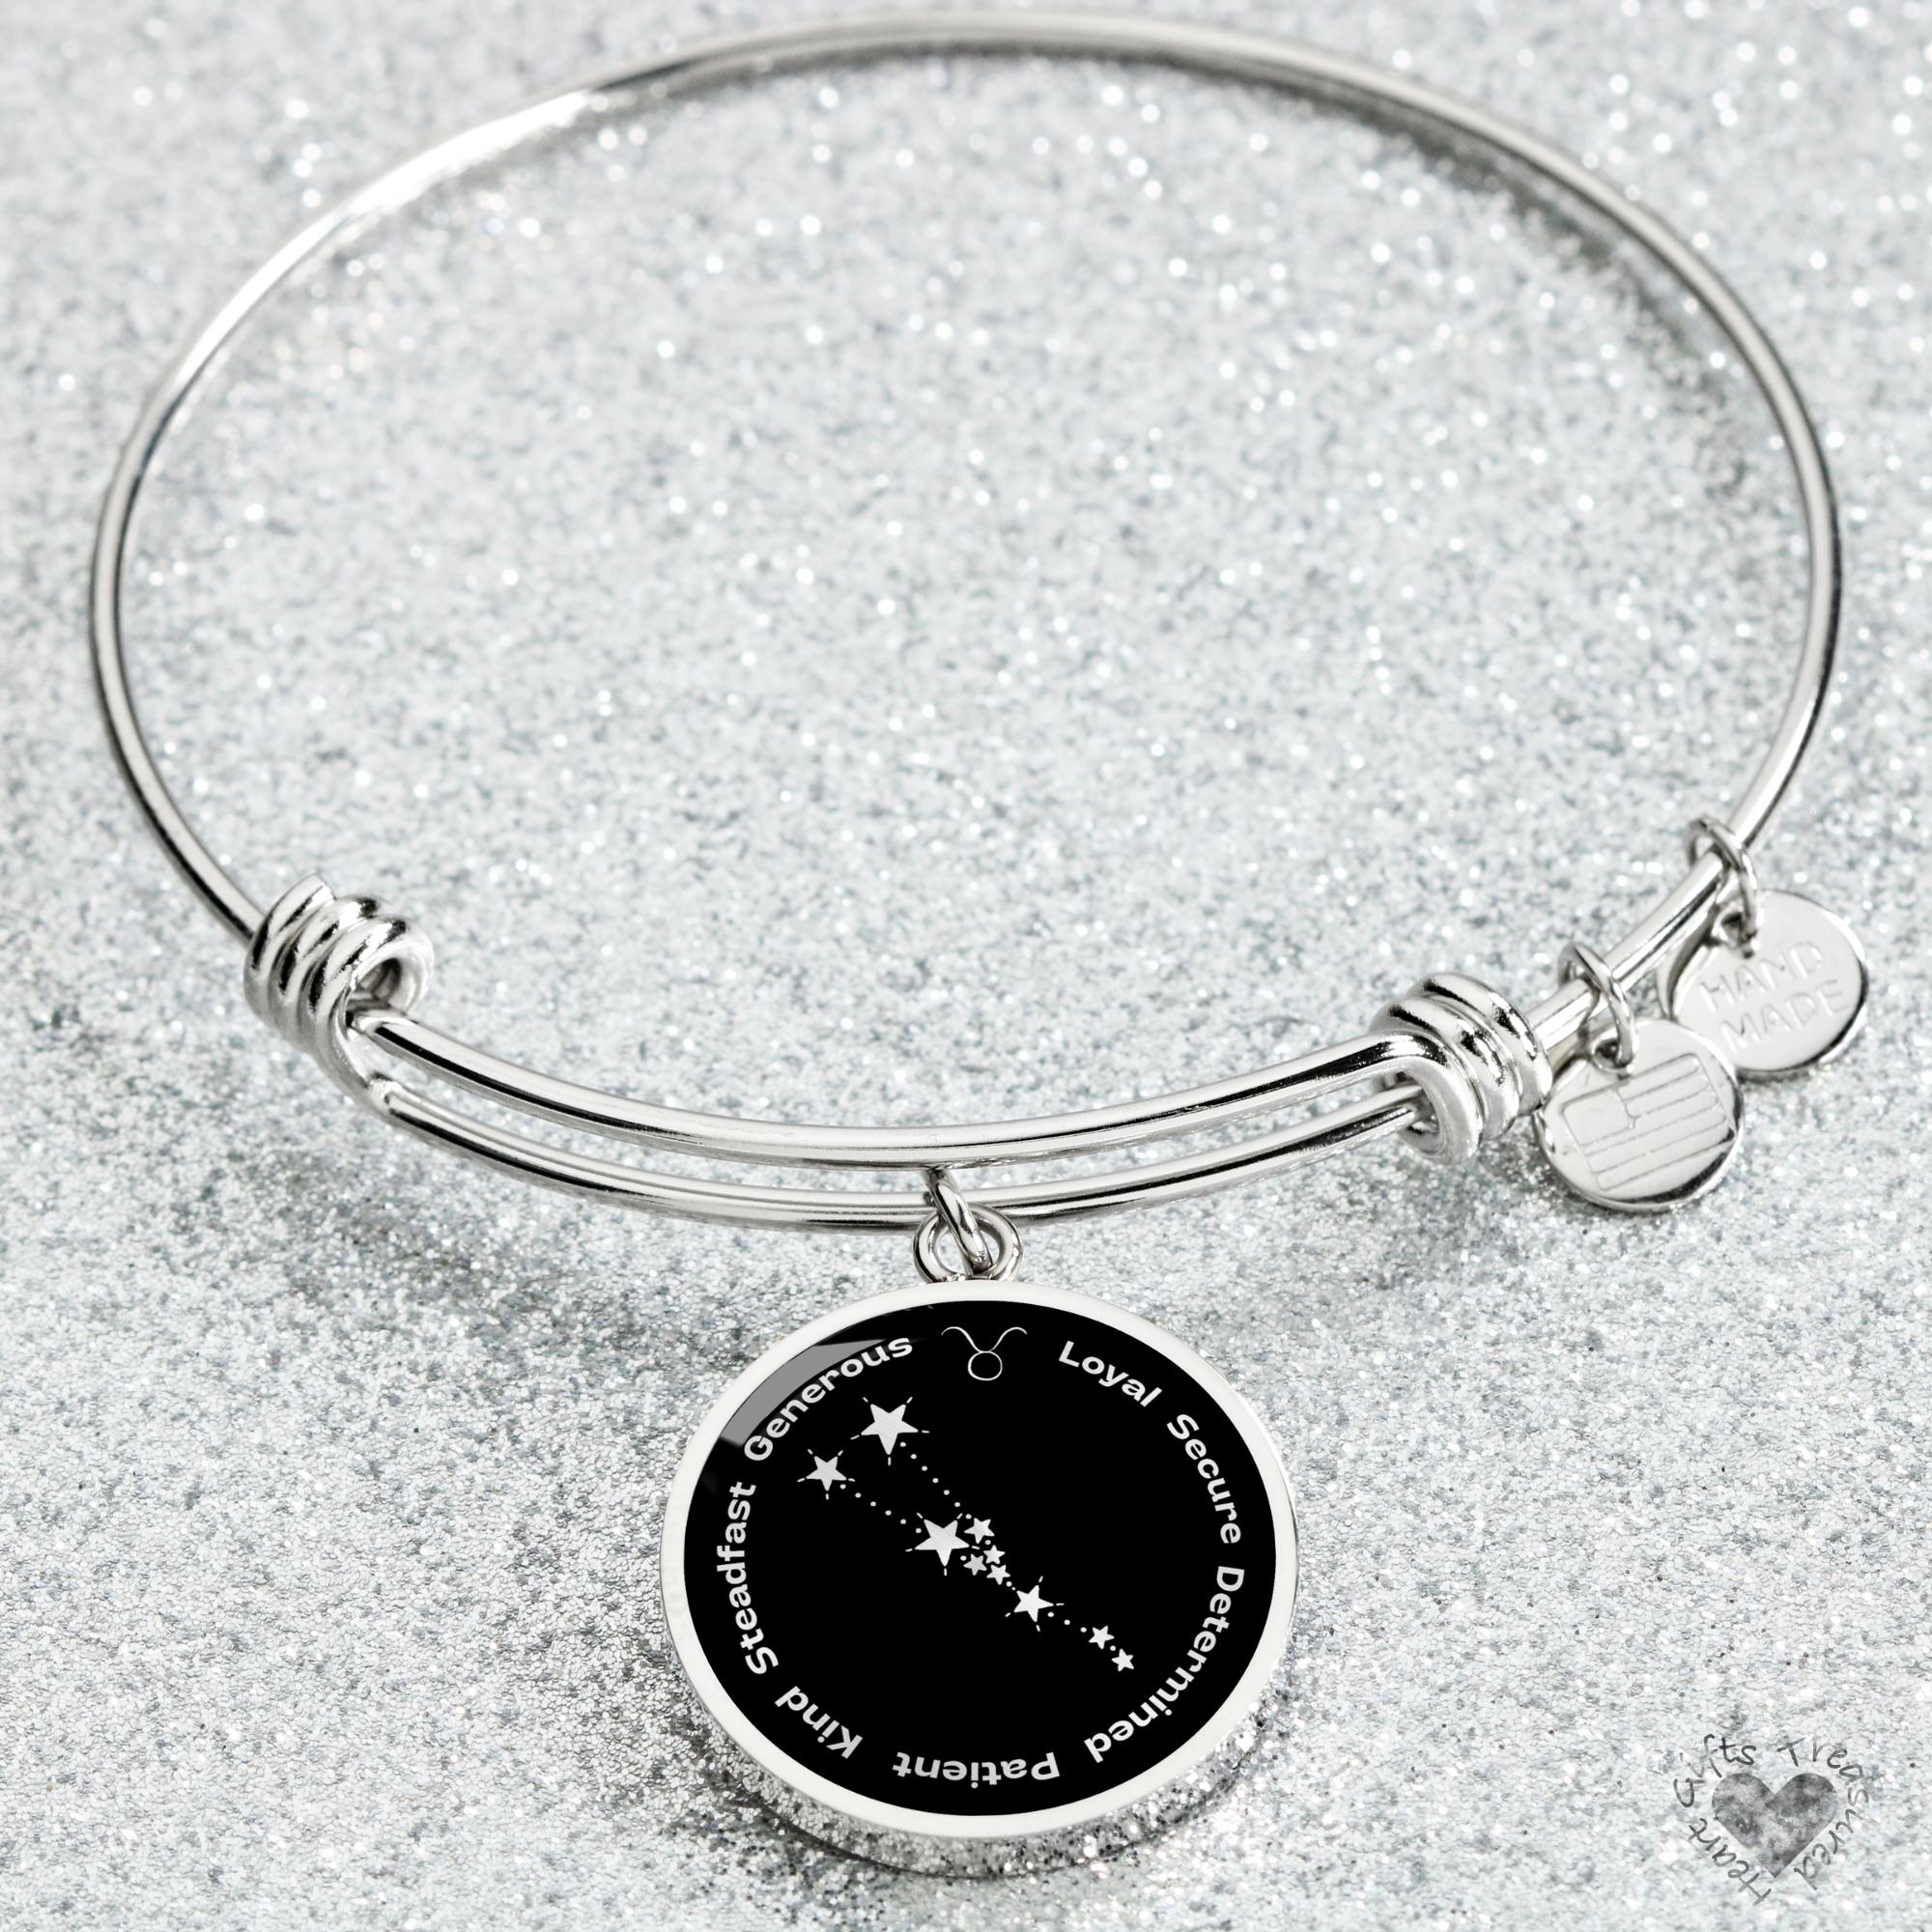 Taurus Zodiac Sign Bracelet - Luxury Bangle (Silver) / No